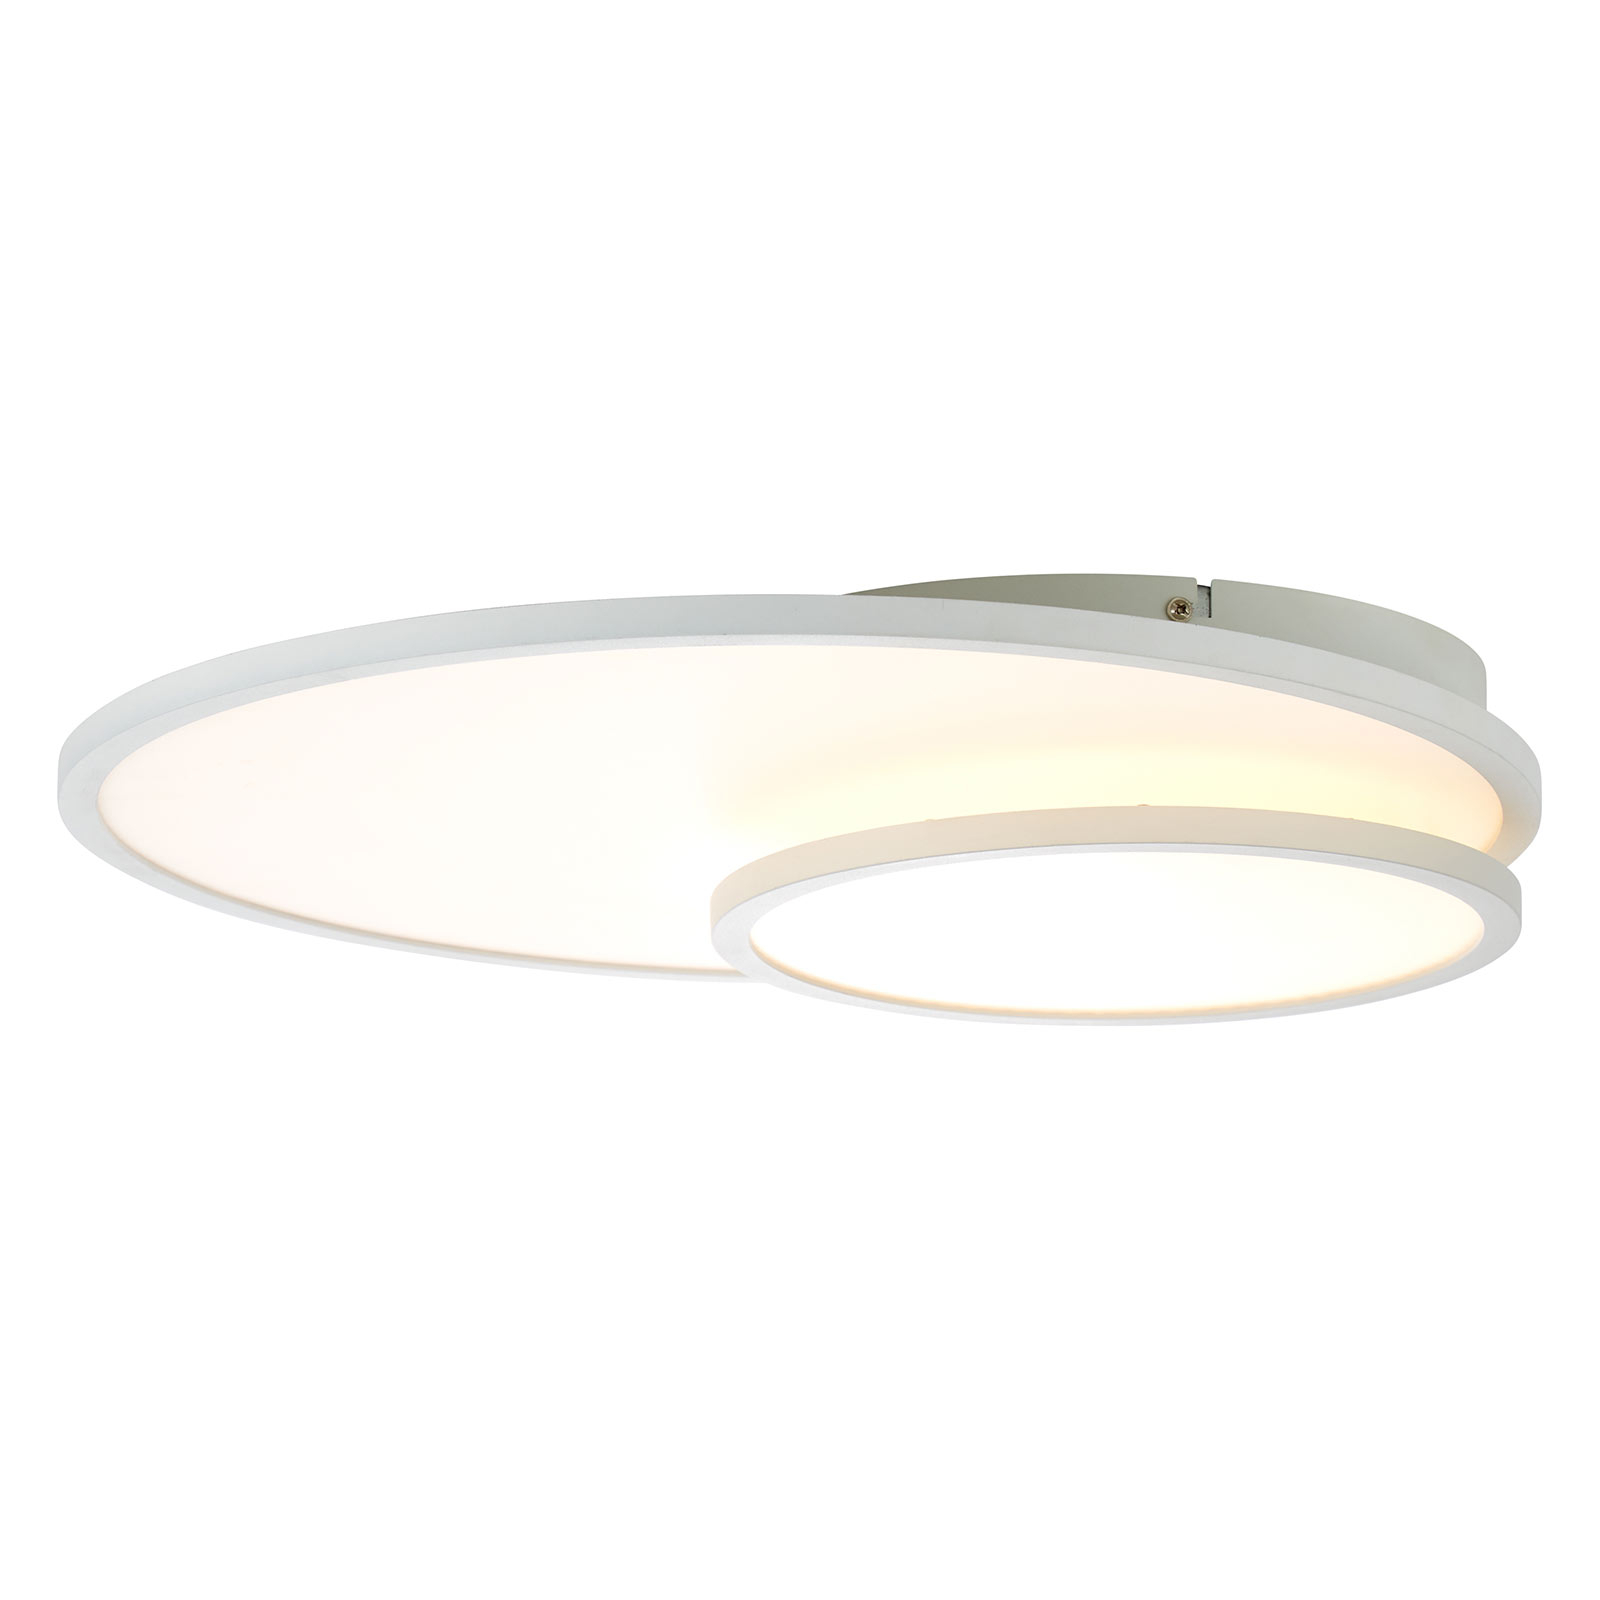 Plafonnier LED Bility, rond, cadre blanc